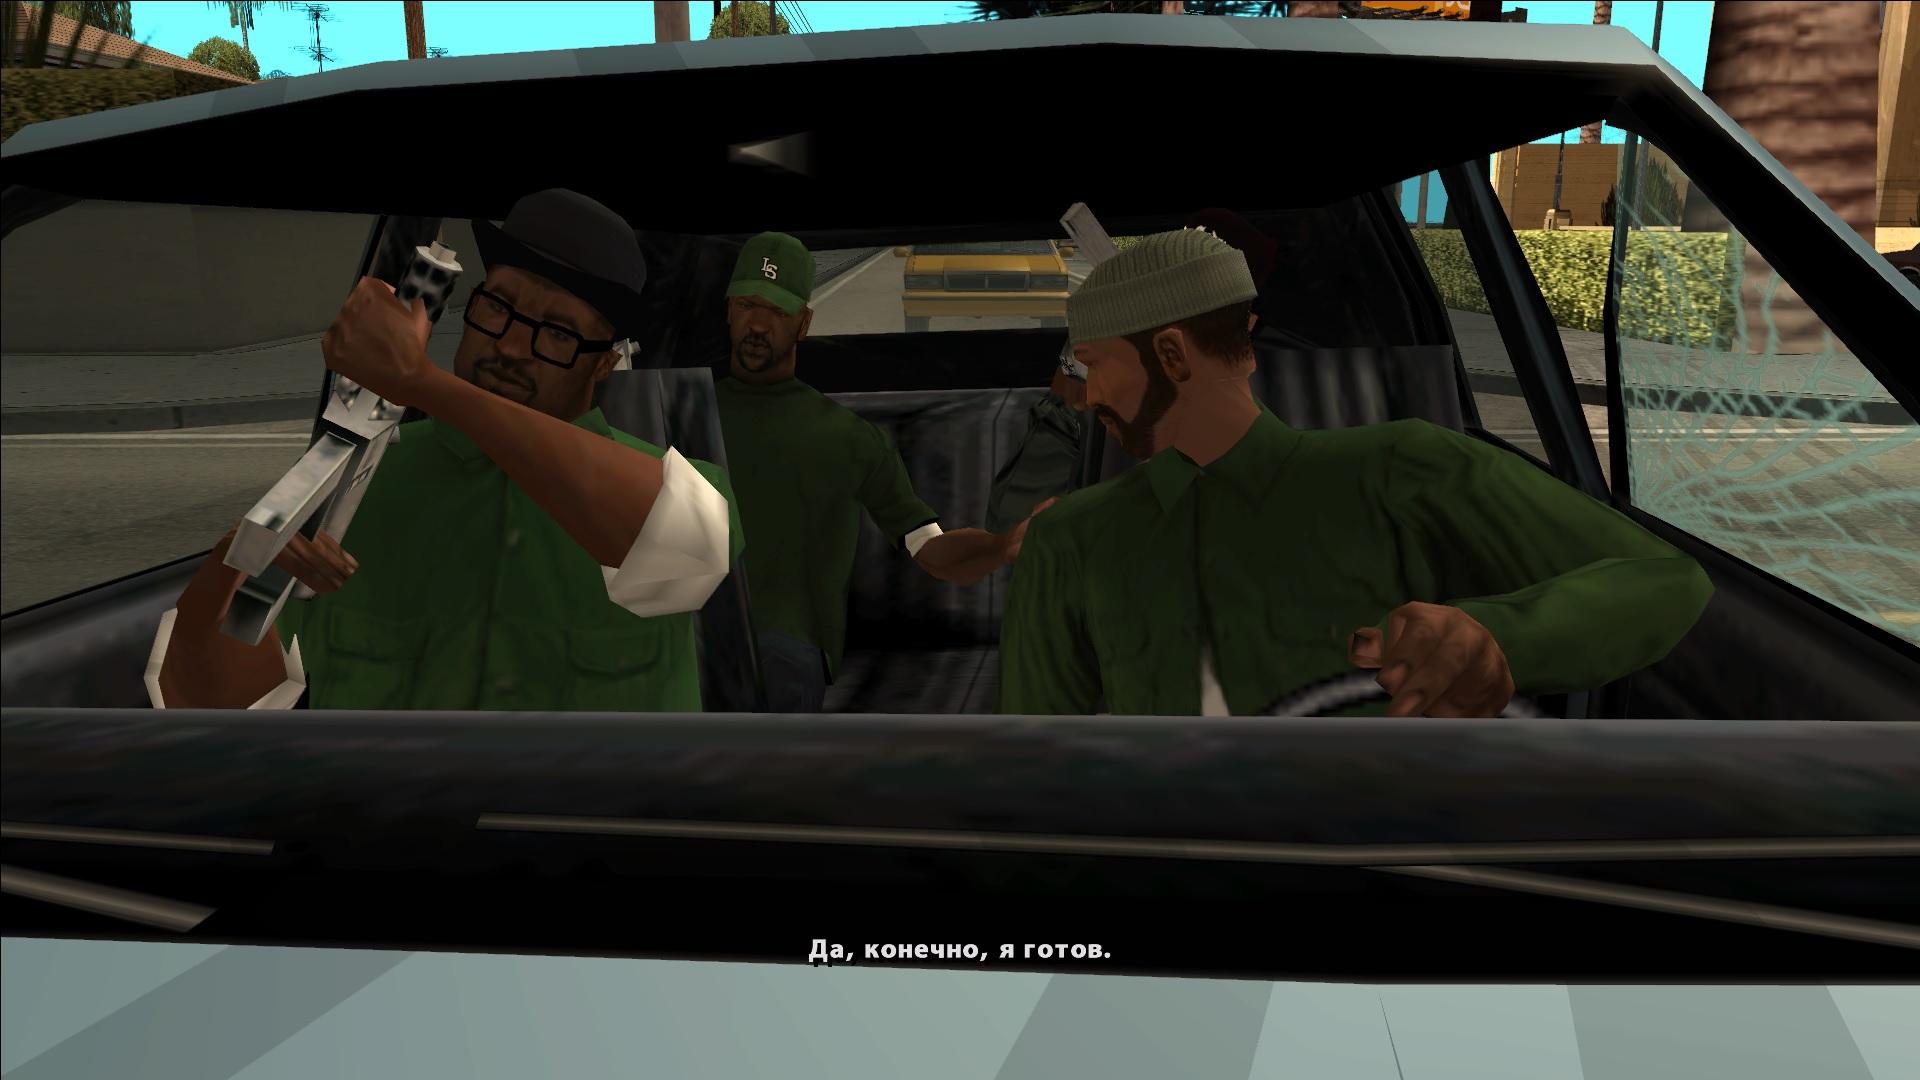 Grand Theft Auto: San Andreas - c модами (fix full screen, PS2 light @ sun) - Grand Theft Auto: San Andreas